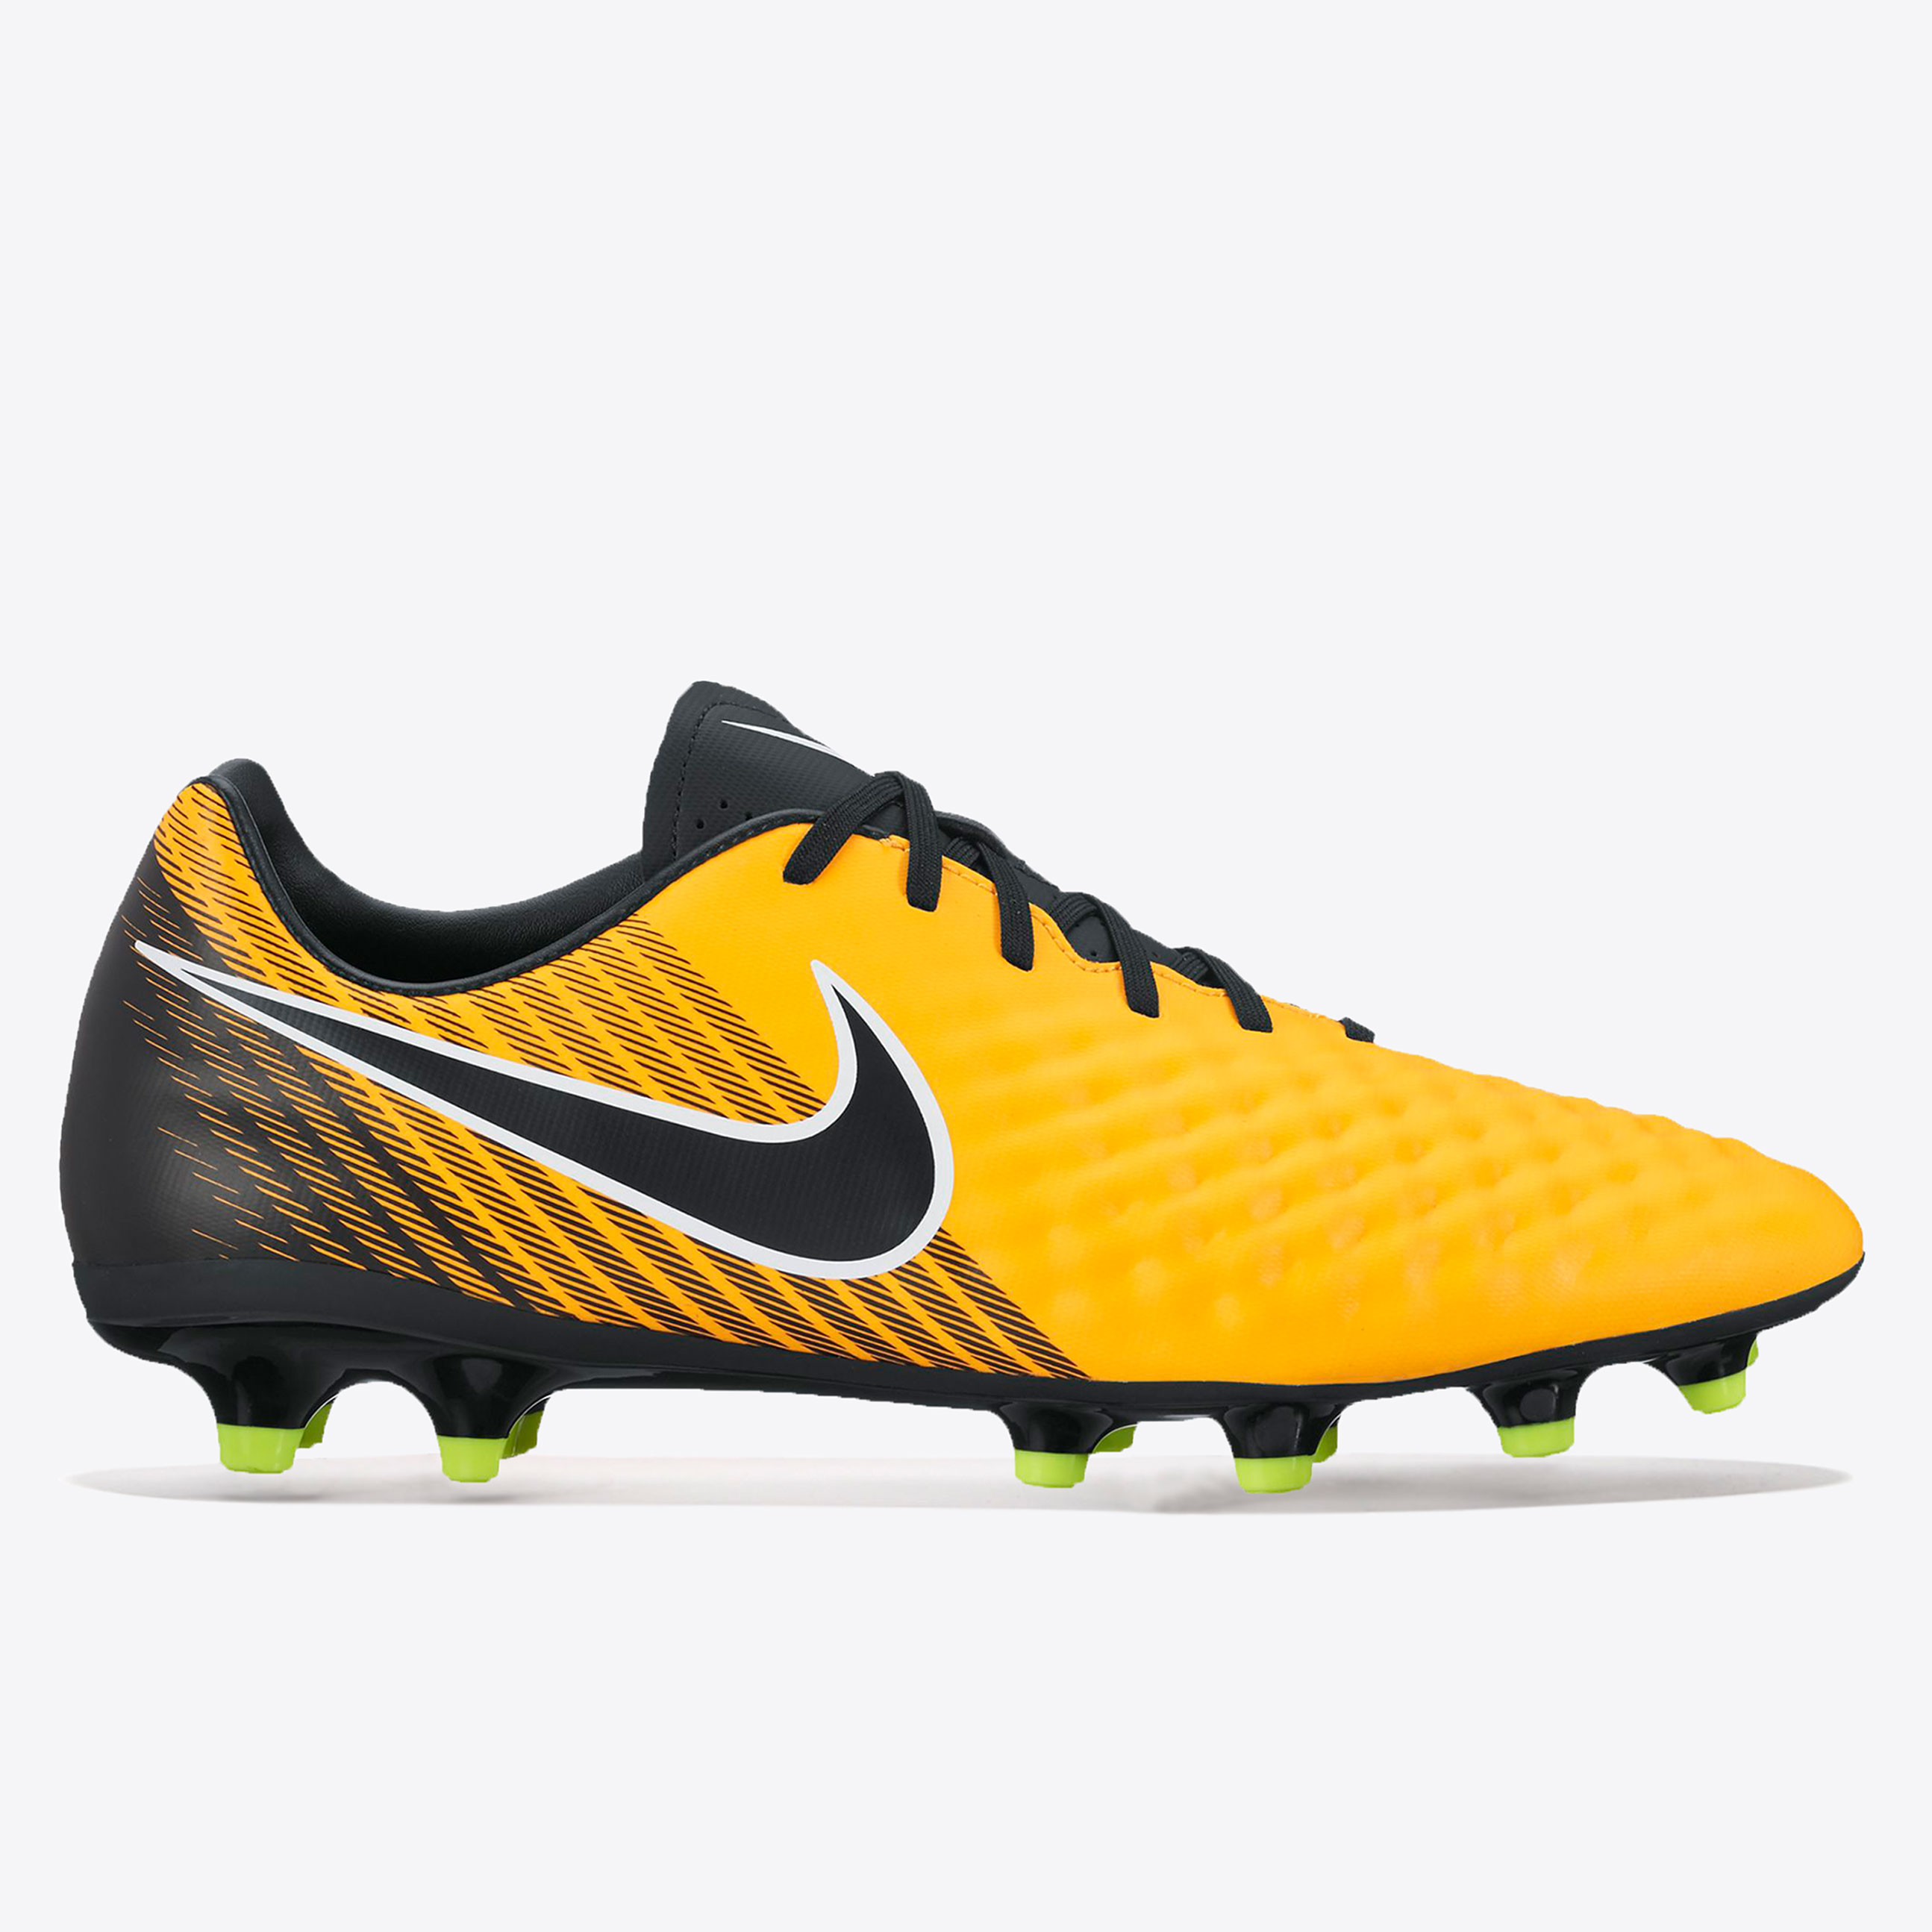 Nike Magista Onda II Firm Ground Football Boots - Laser Orange/Black/W